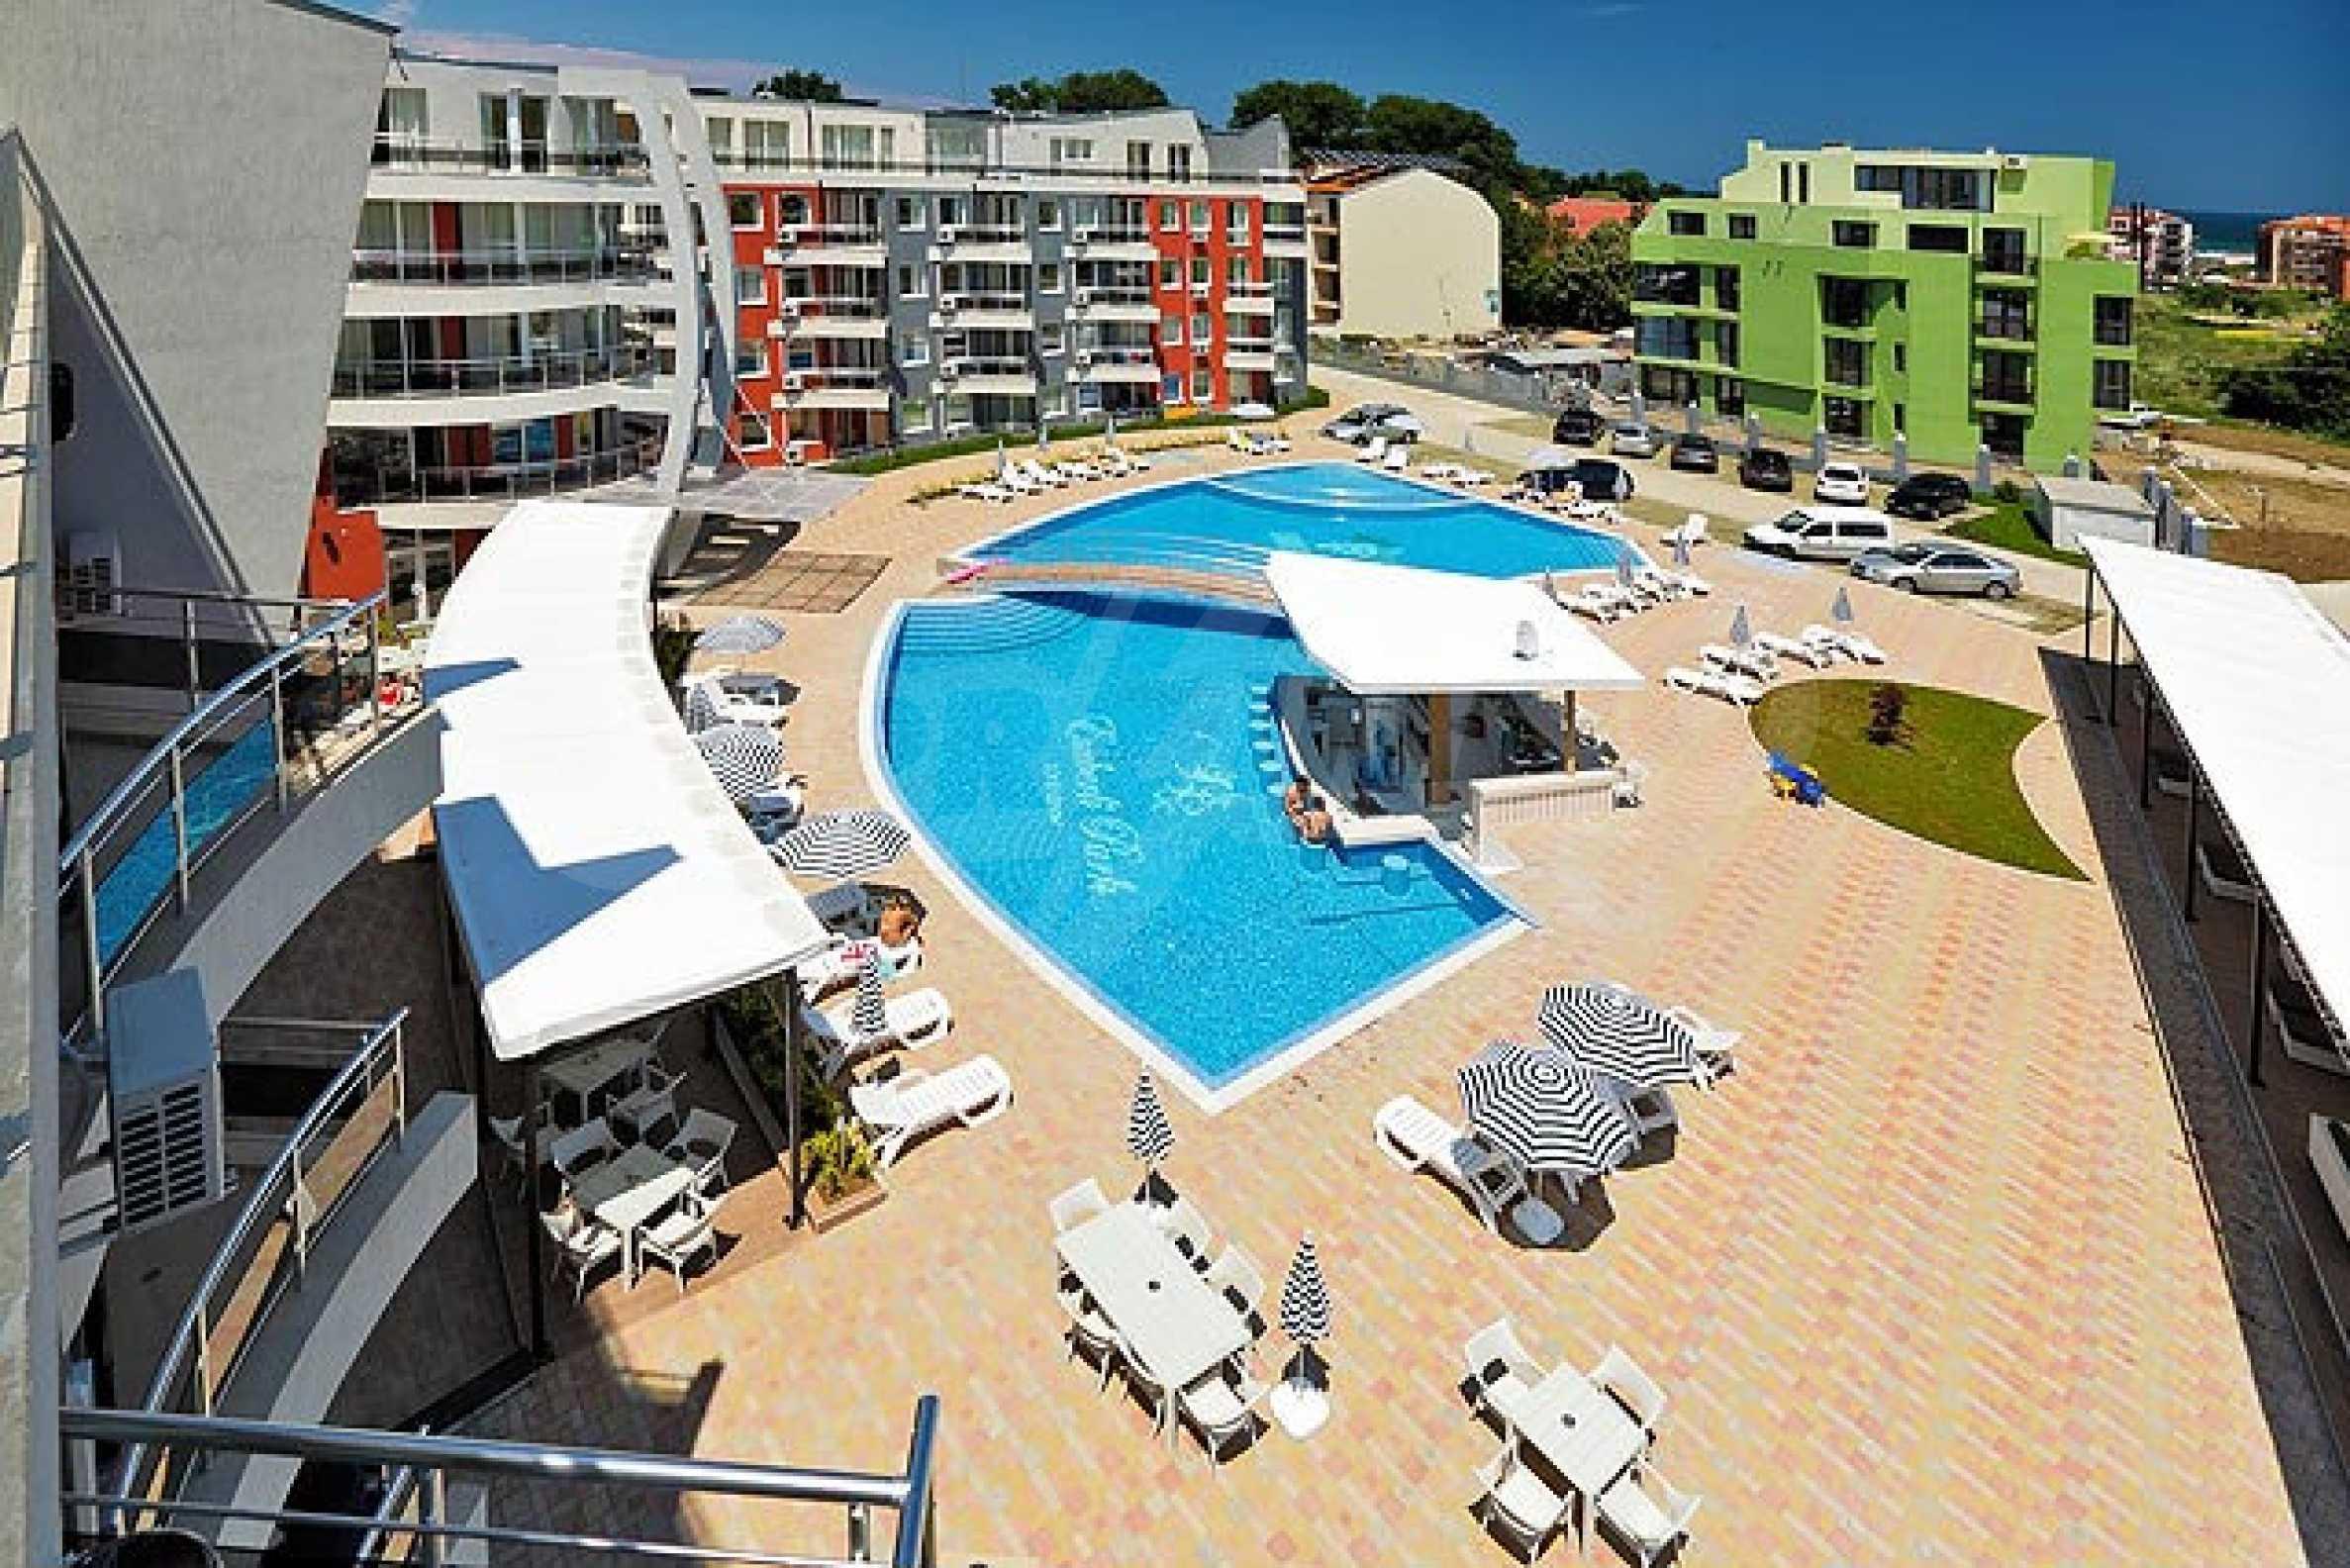 Трехкомнатный апартамент на продажу в комплексе Emberli в курорте Лозенец